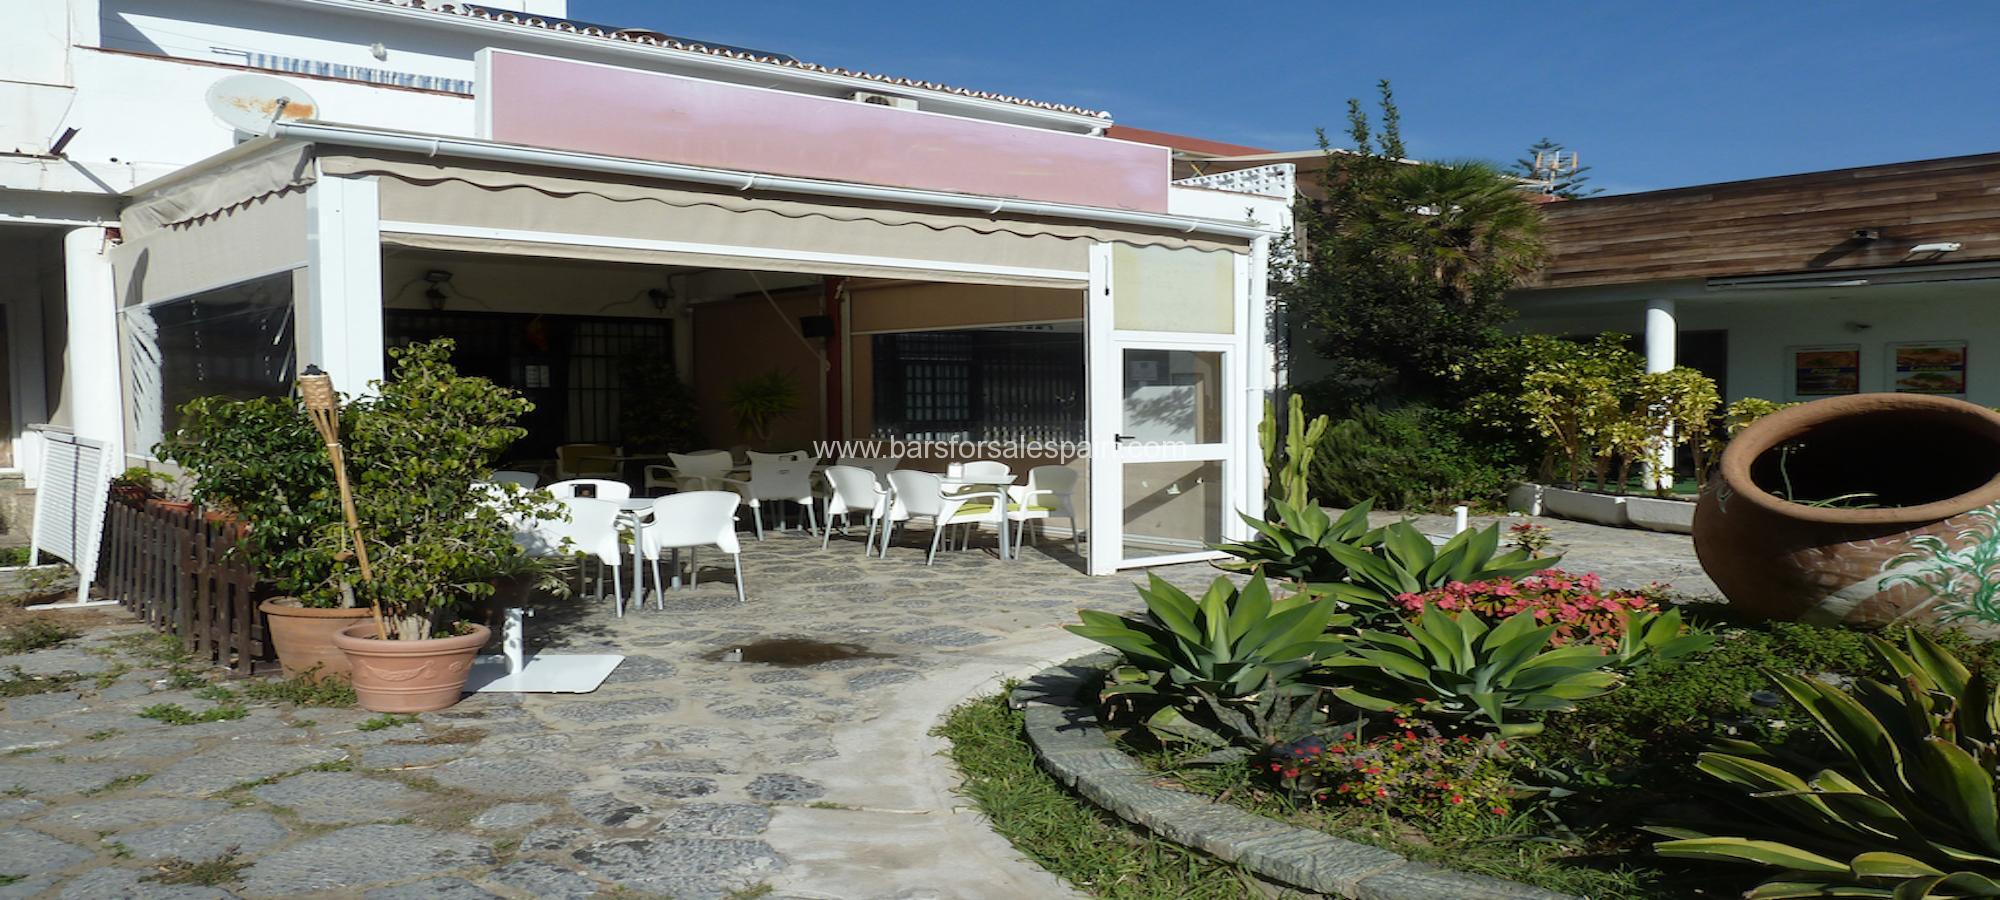 Quaint cafe bar for sale in Fuengirola, Costa del Sol, Spain